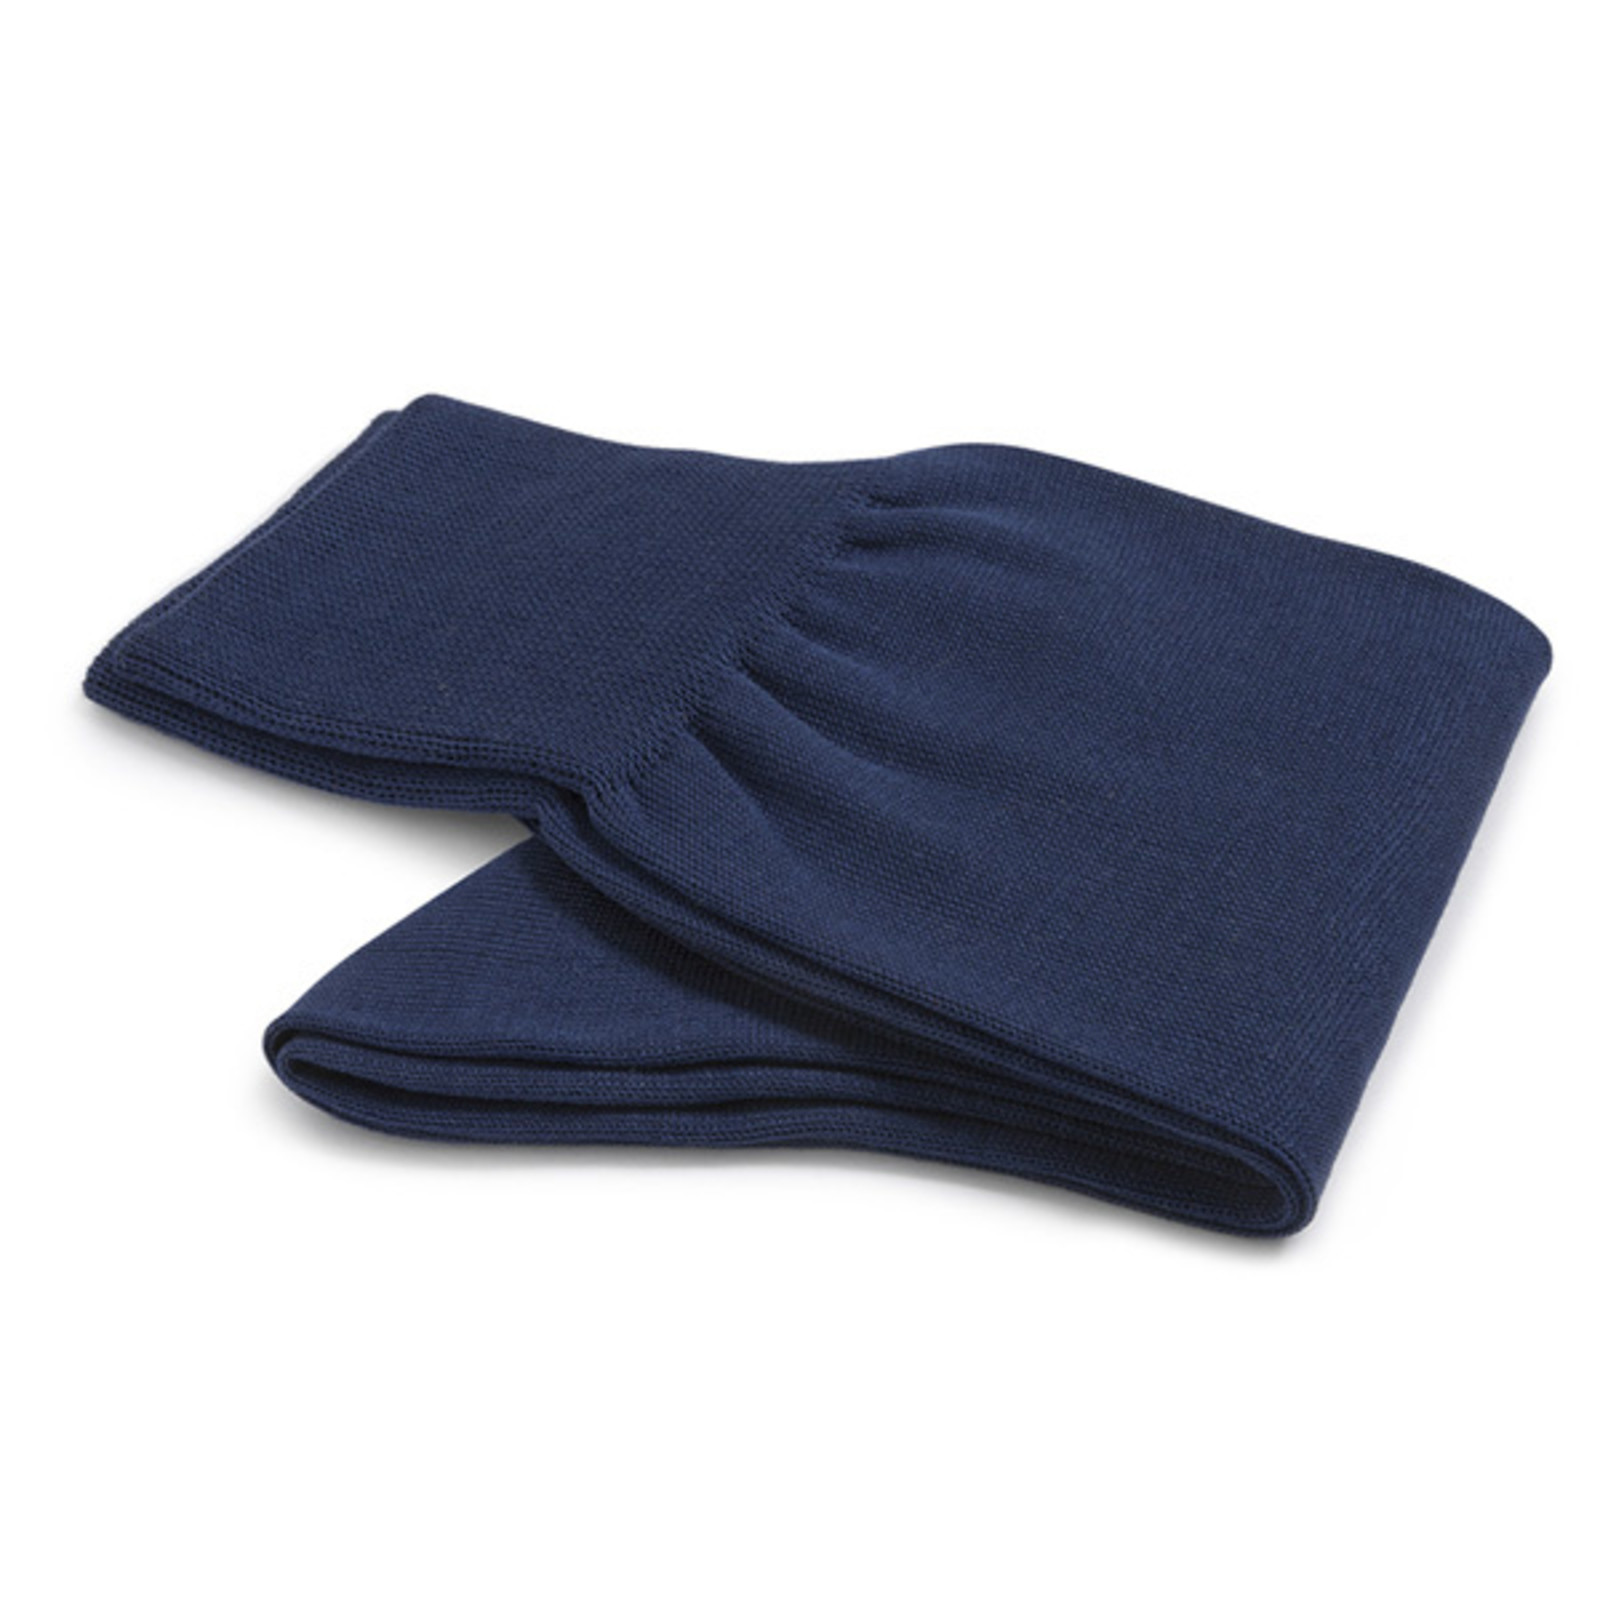 Carlo Lanza Königsblaue Socken Baumwolle